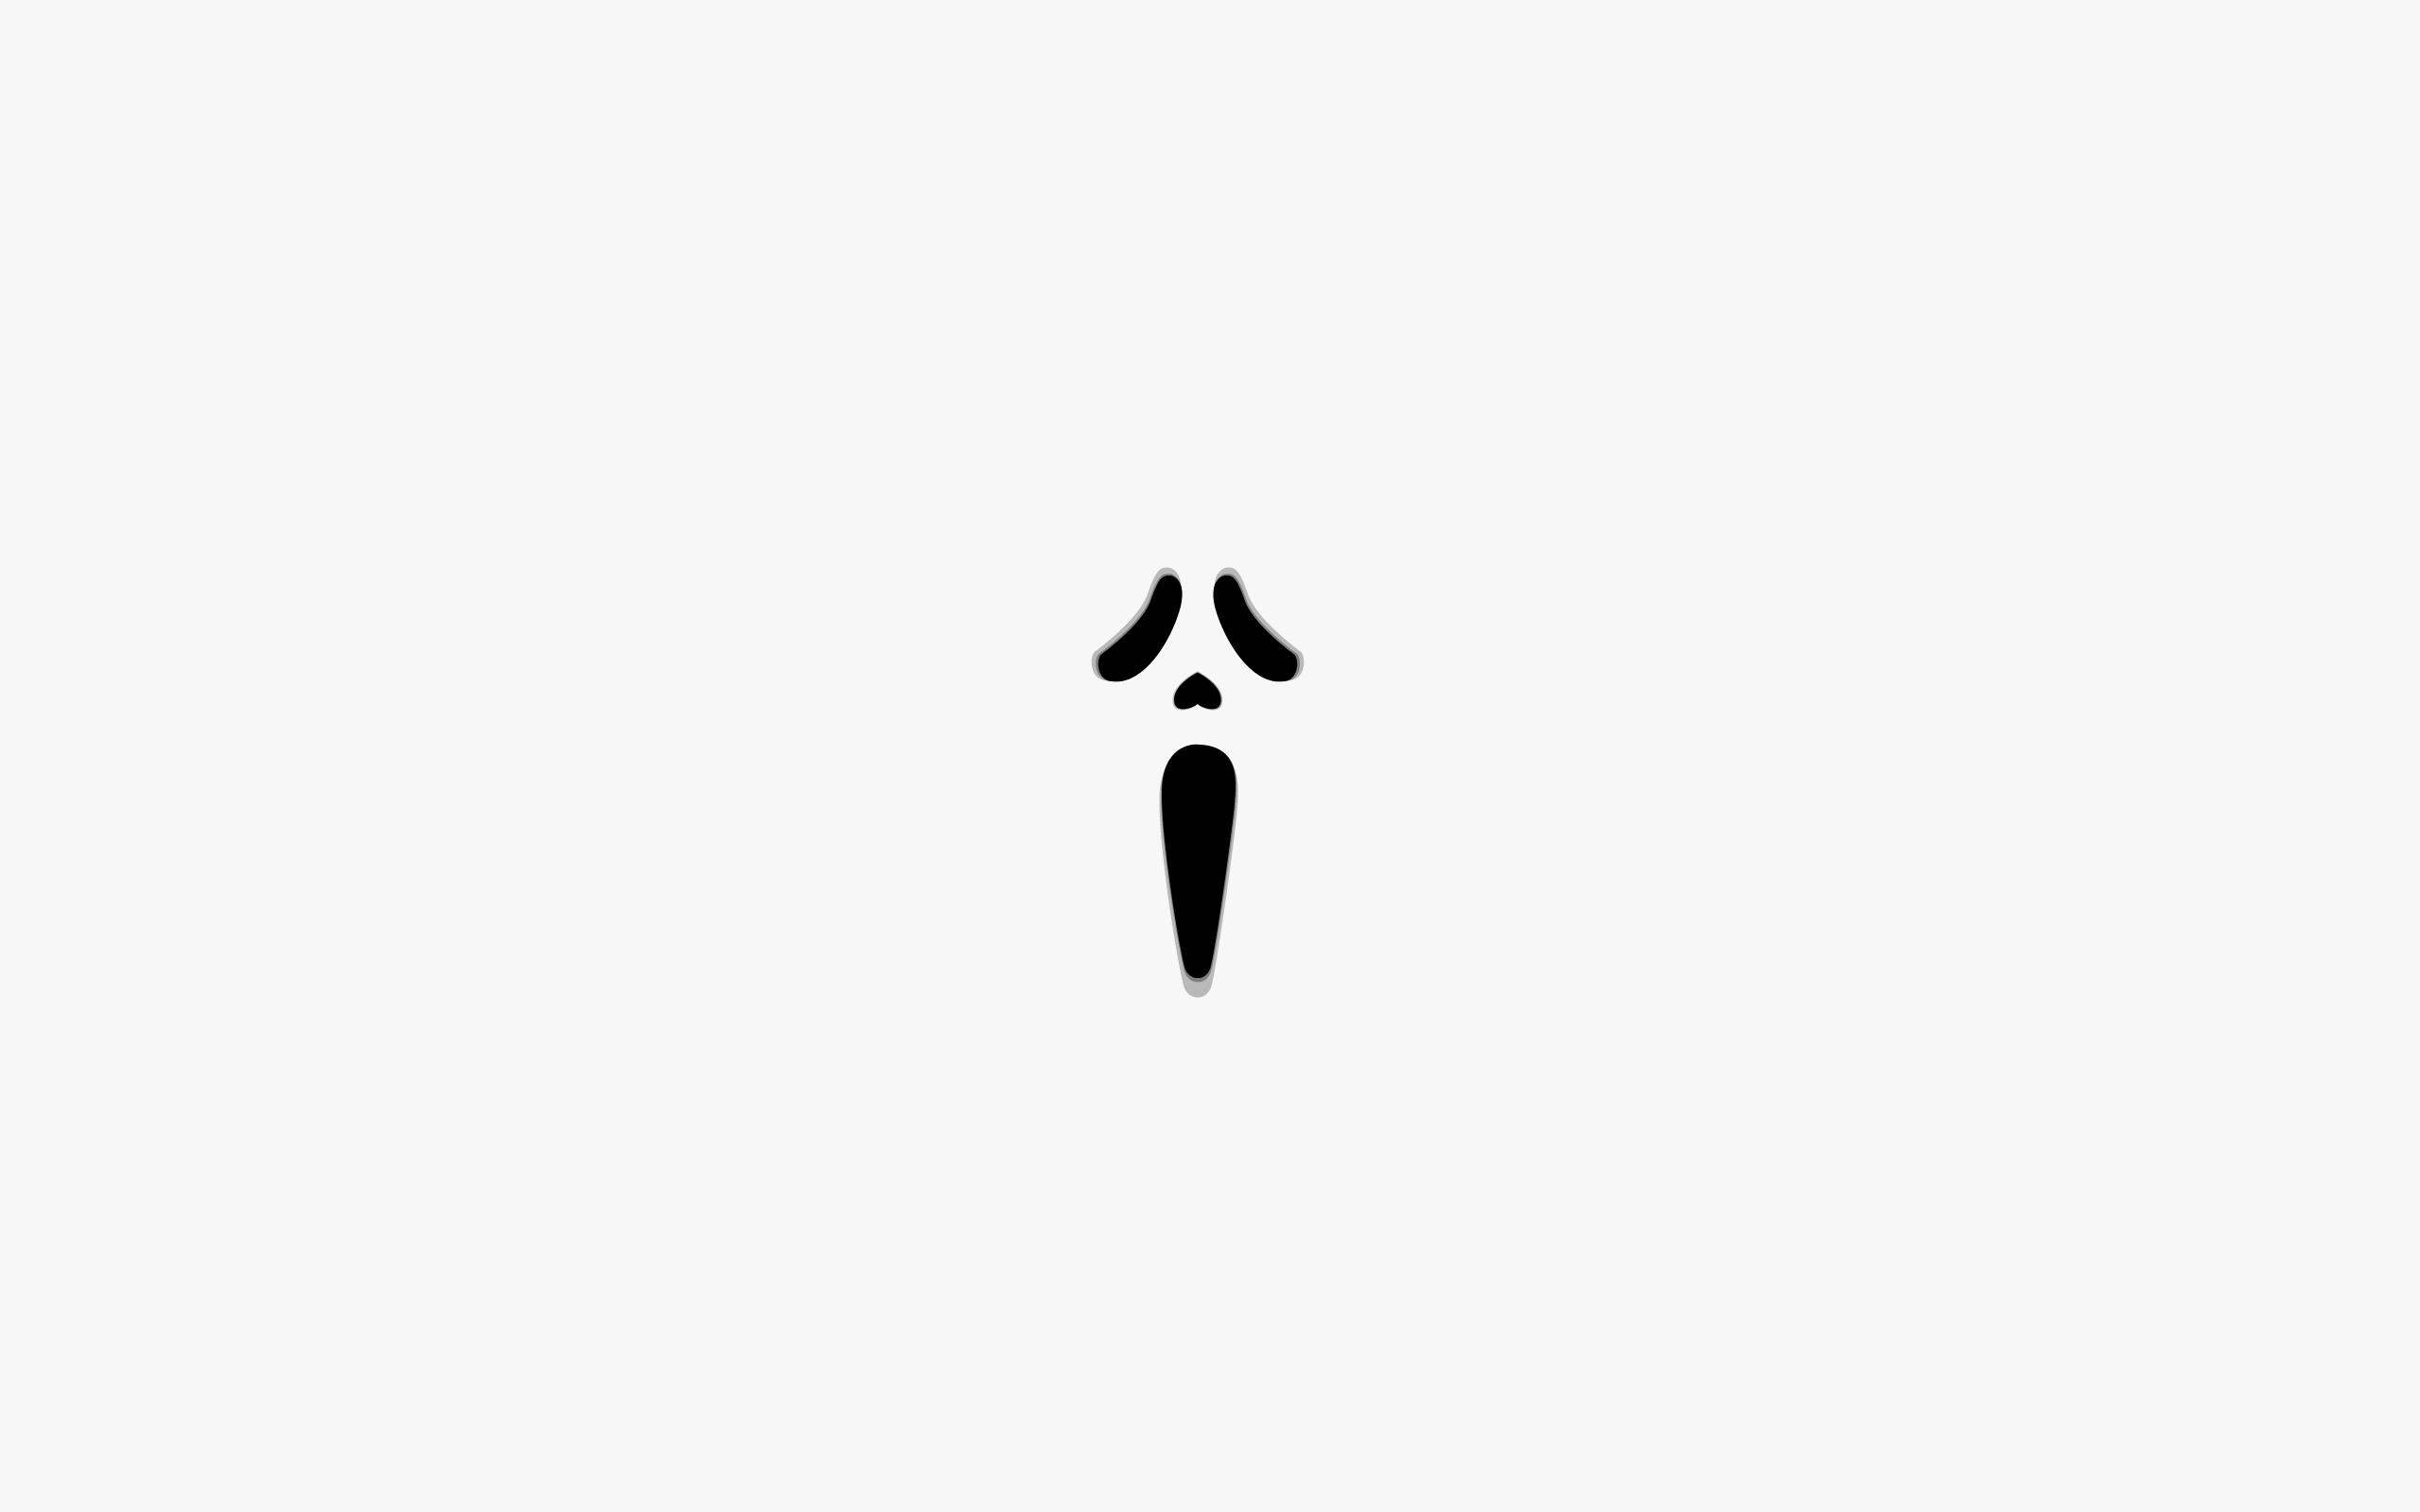 Wallpaper Minimalism Logo Brand Calligraphy Scream